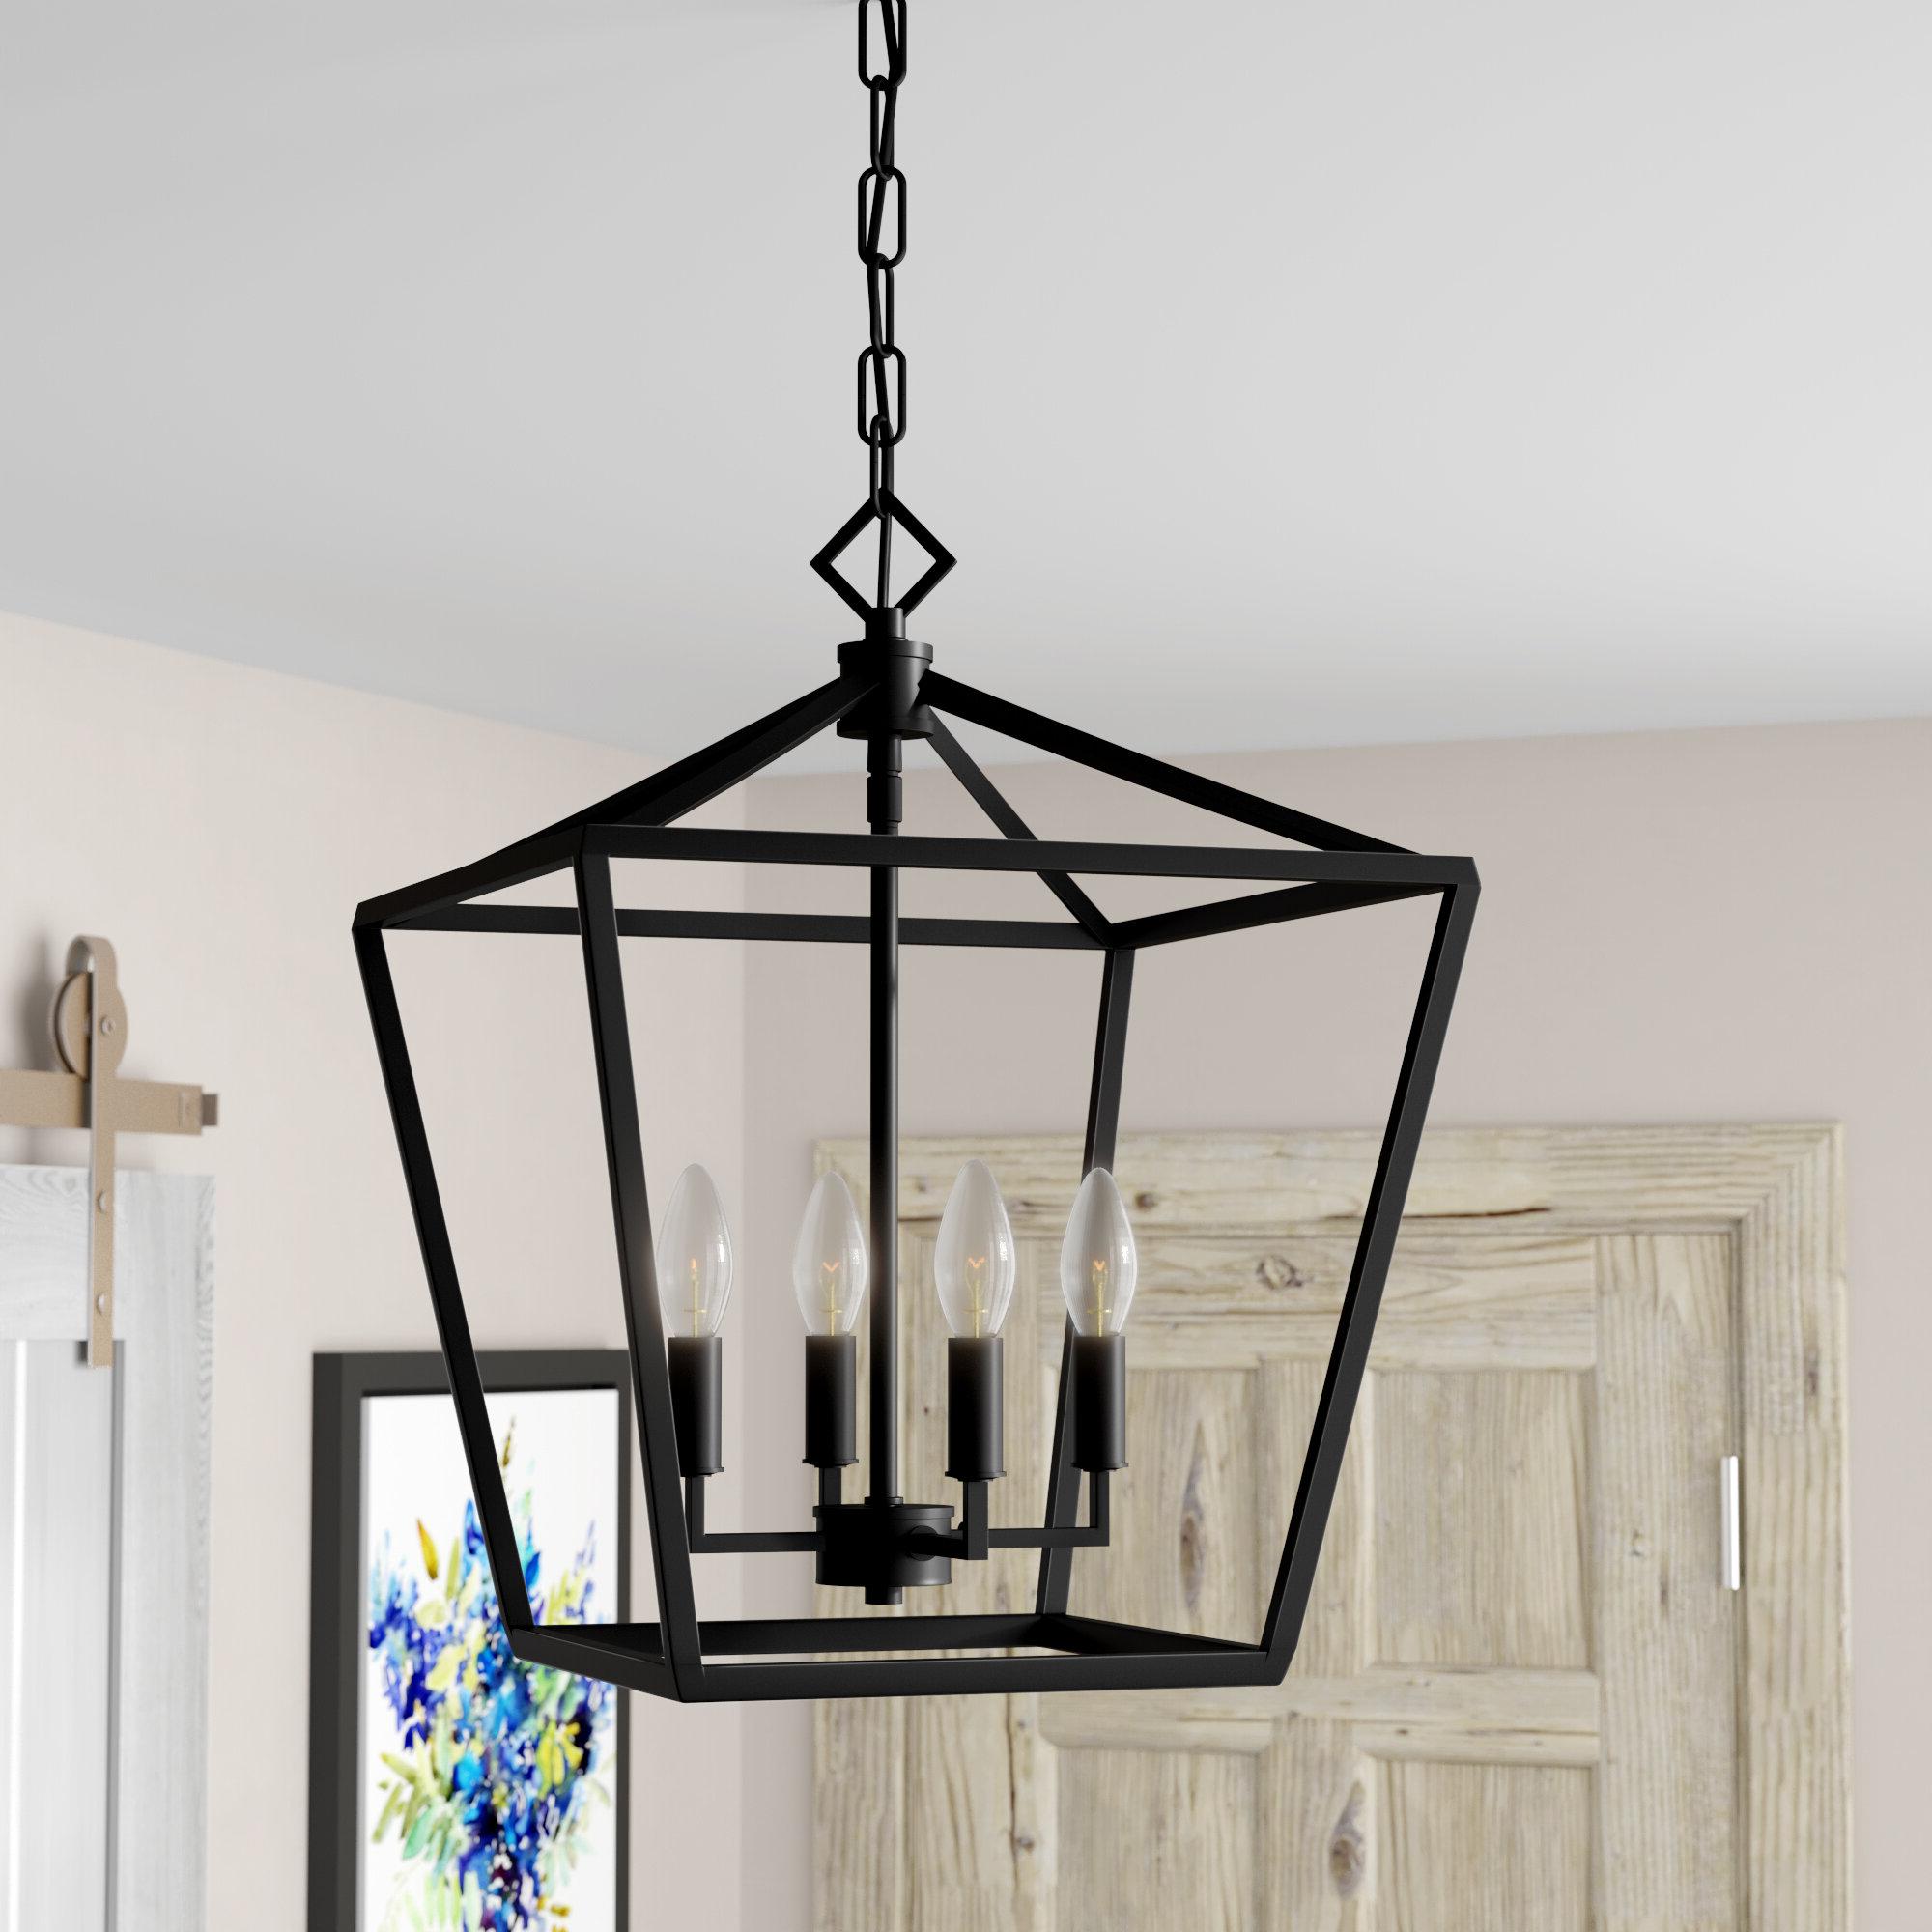 Poisson 4 Light Lantern Pendant With Regard To Famous Odie 4 Light Lantern Square Pendants (Gallery 17 of 20)